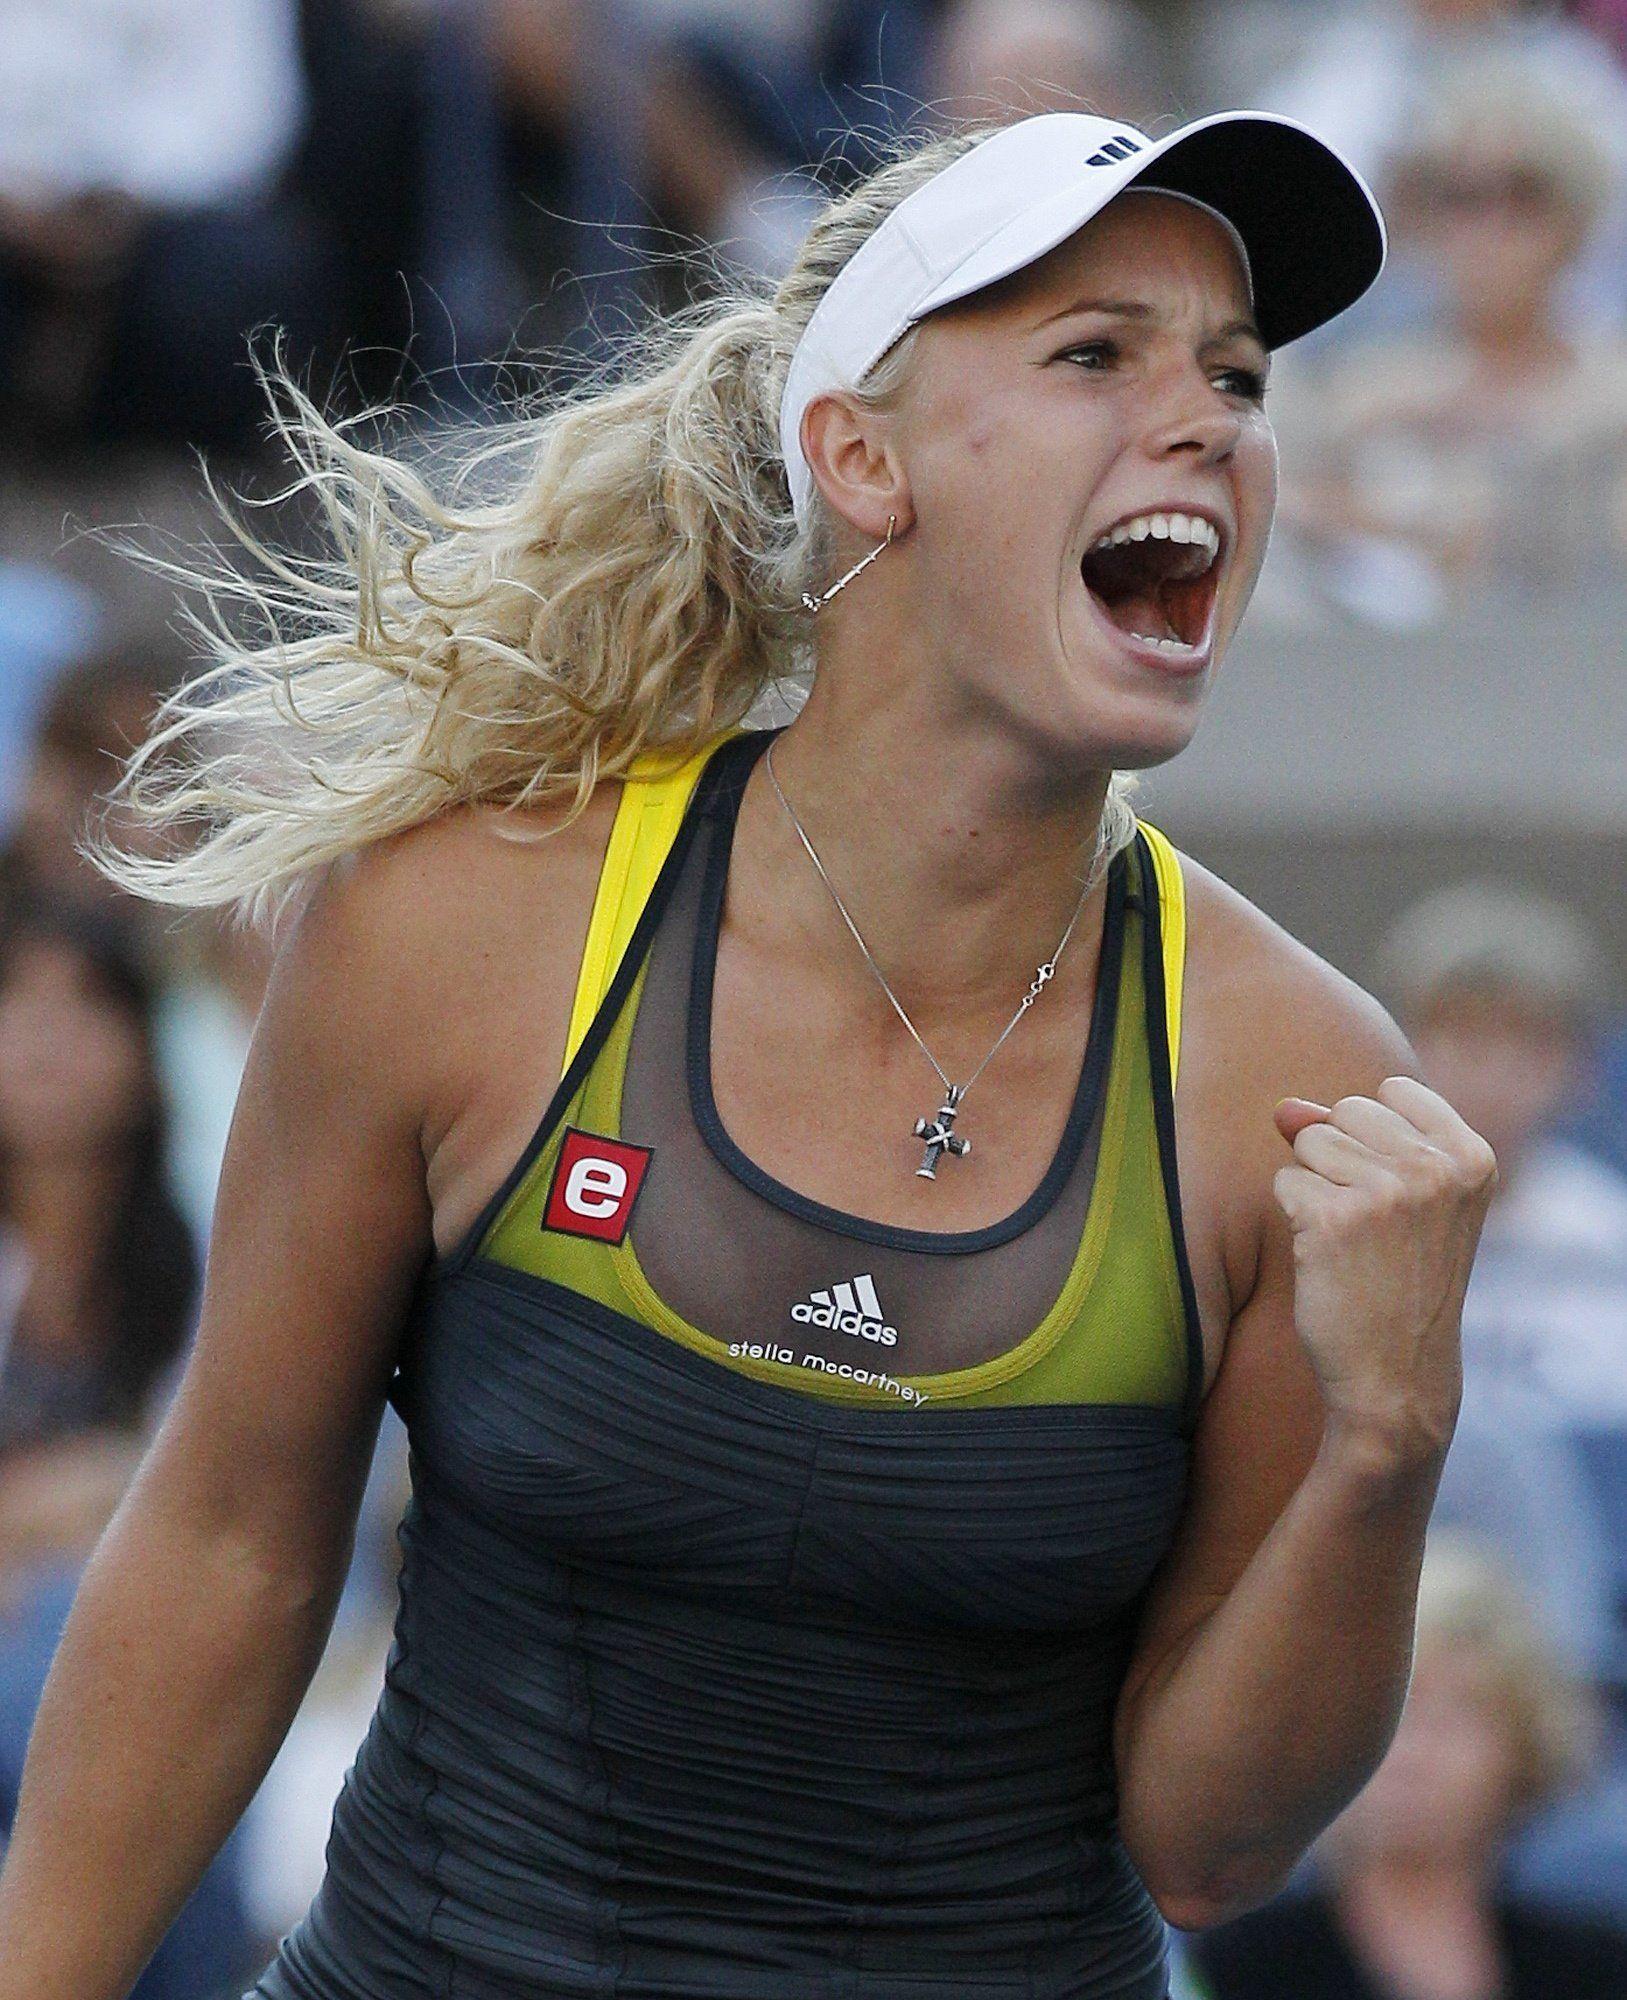 Pin By Tennis Express On We Love Tennis Sports Women Professional Tennis Players Caroline Wozniacki